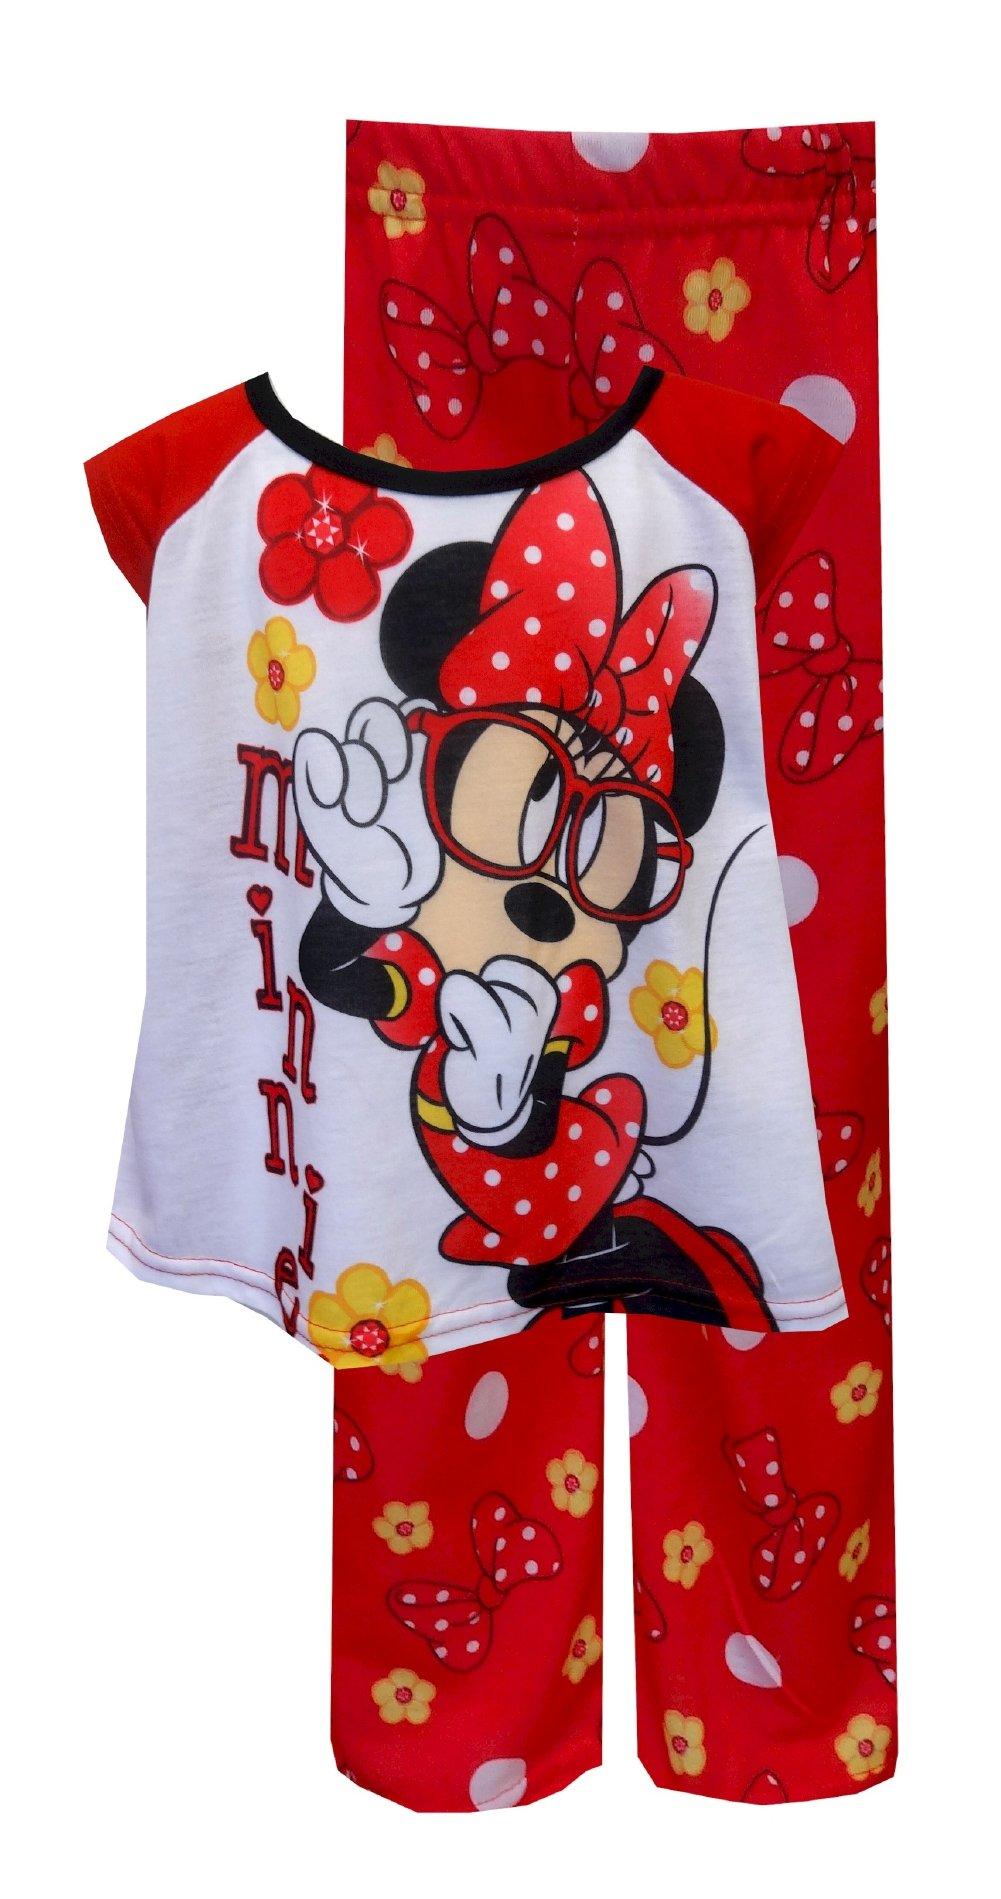 AME Sleepwear Girls' Disney Minnie Mouse Looks Good in Glasses Red Pajamas (8)